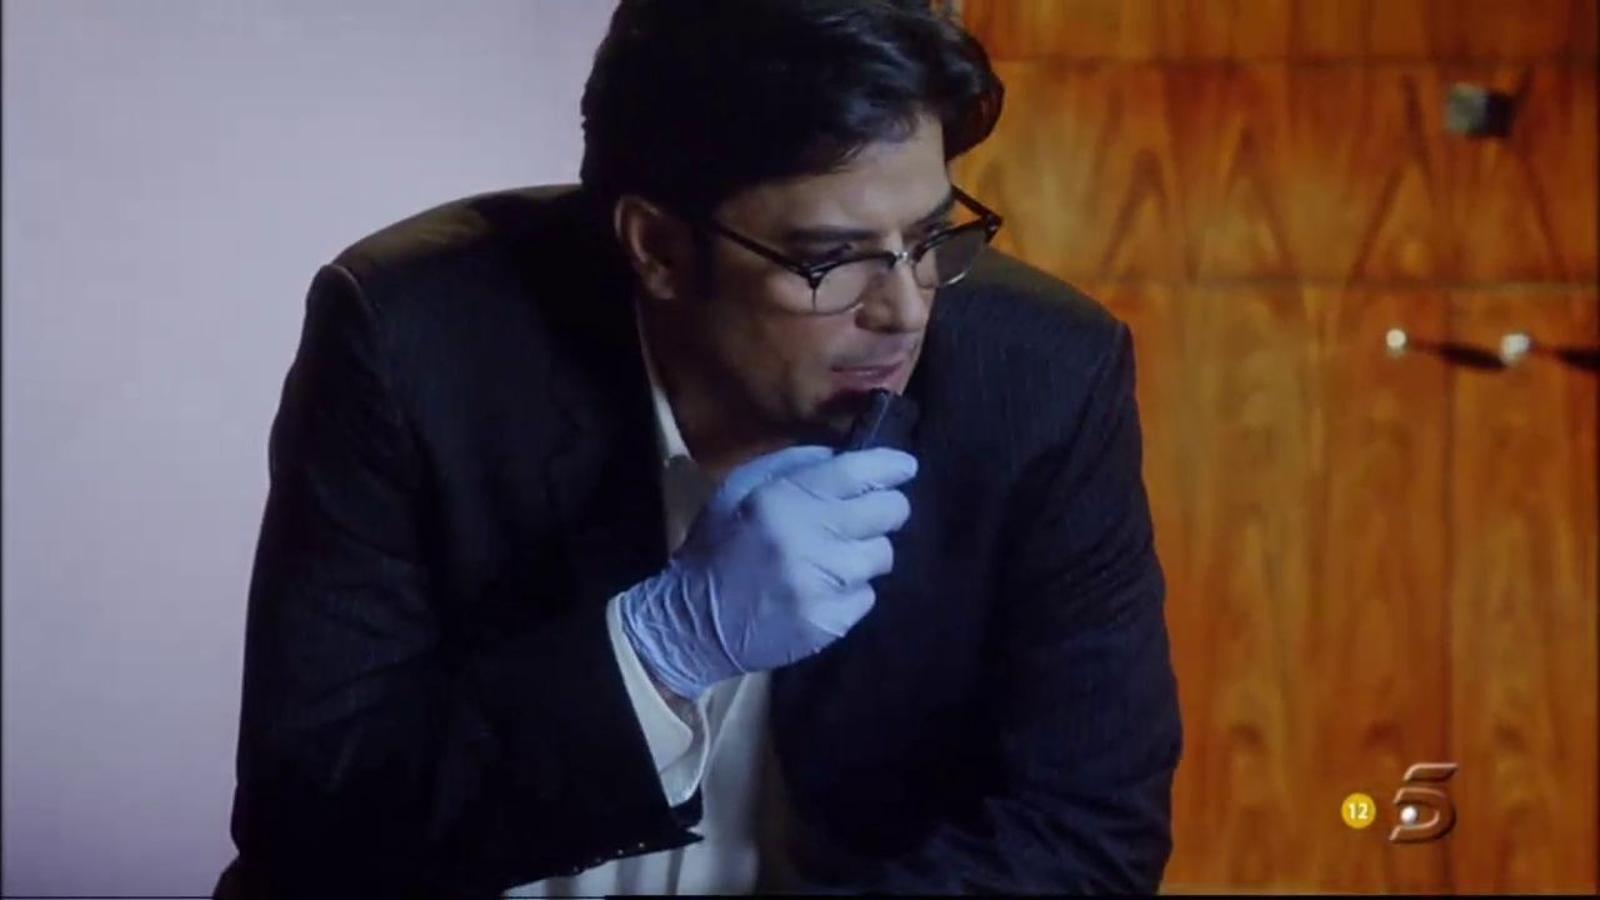 La versió doblada de Telecinco de la visita dels Mossos a 'CSI'